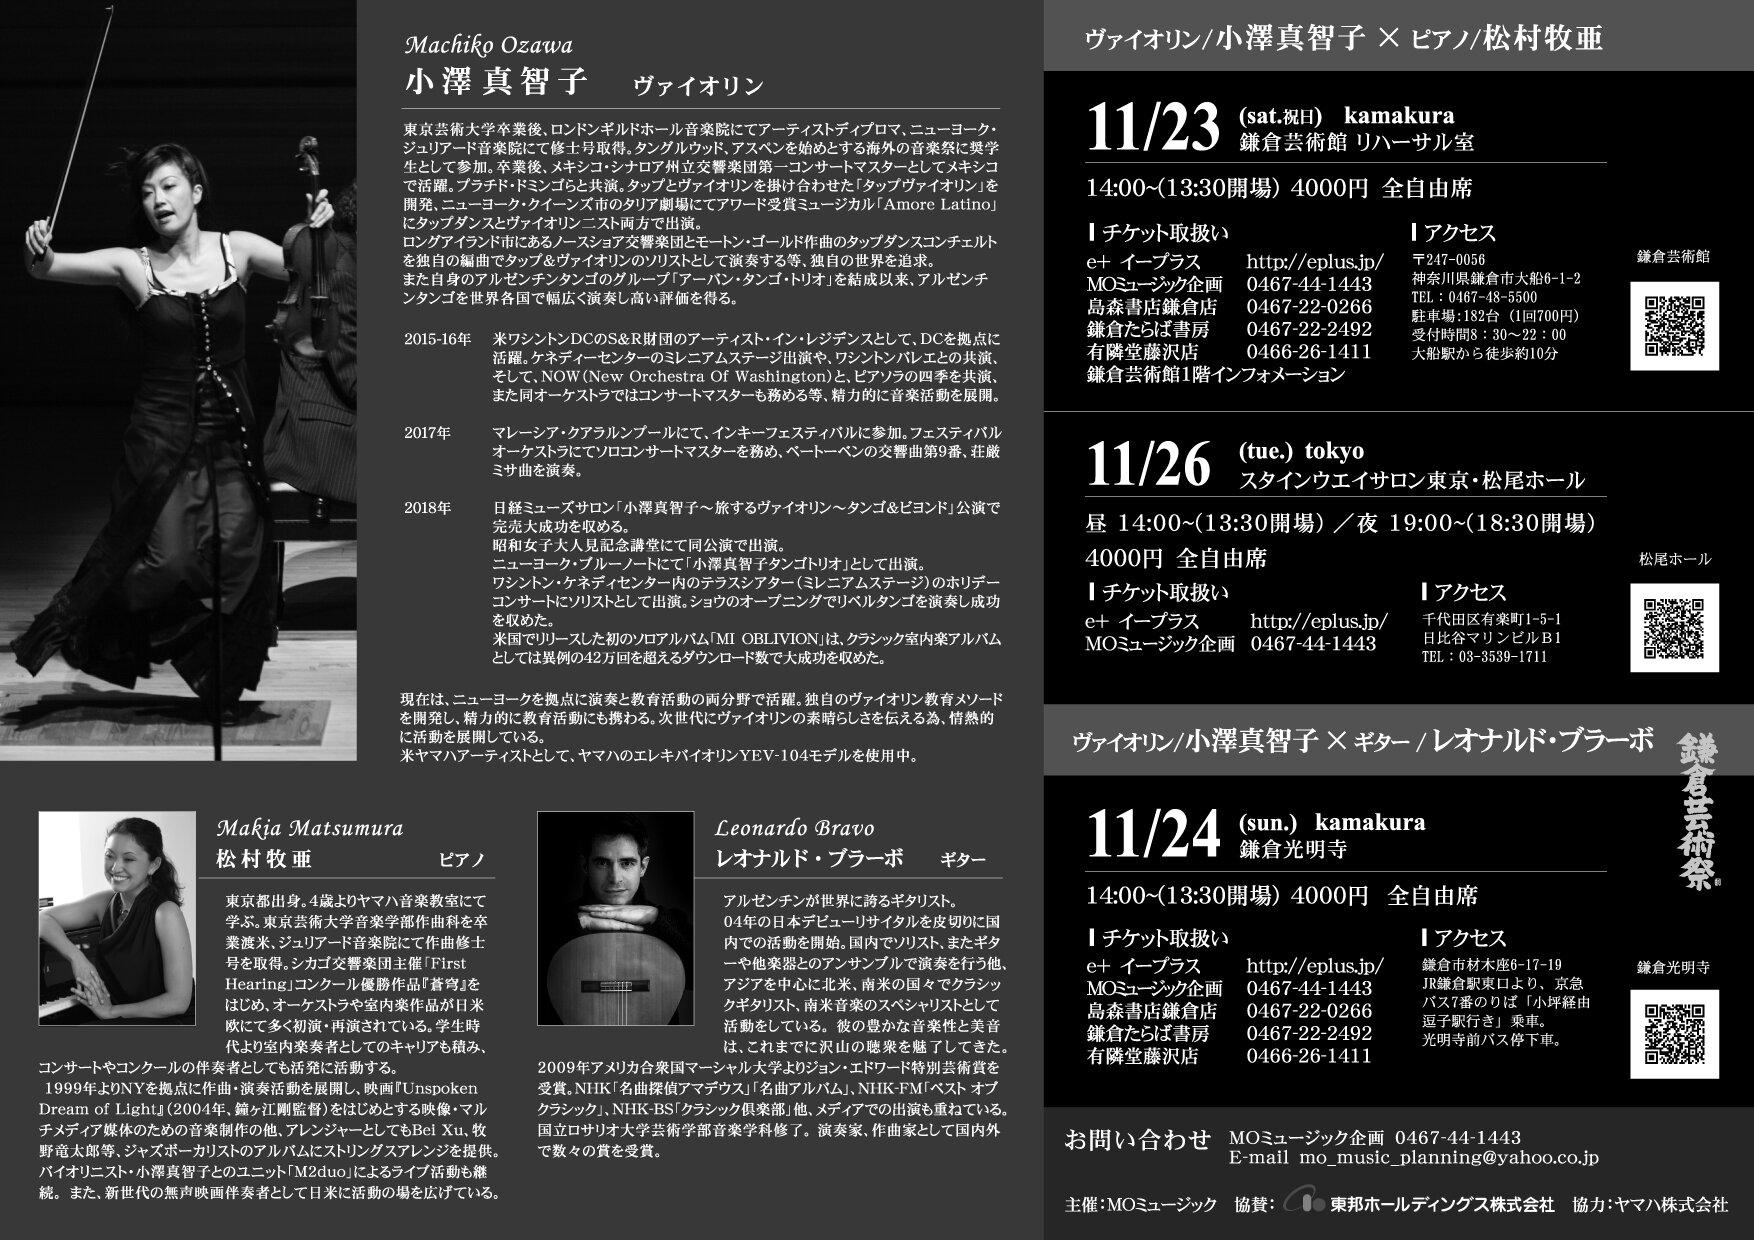 2019ozawa-ol-02.jpg